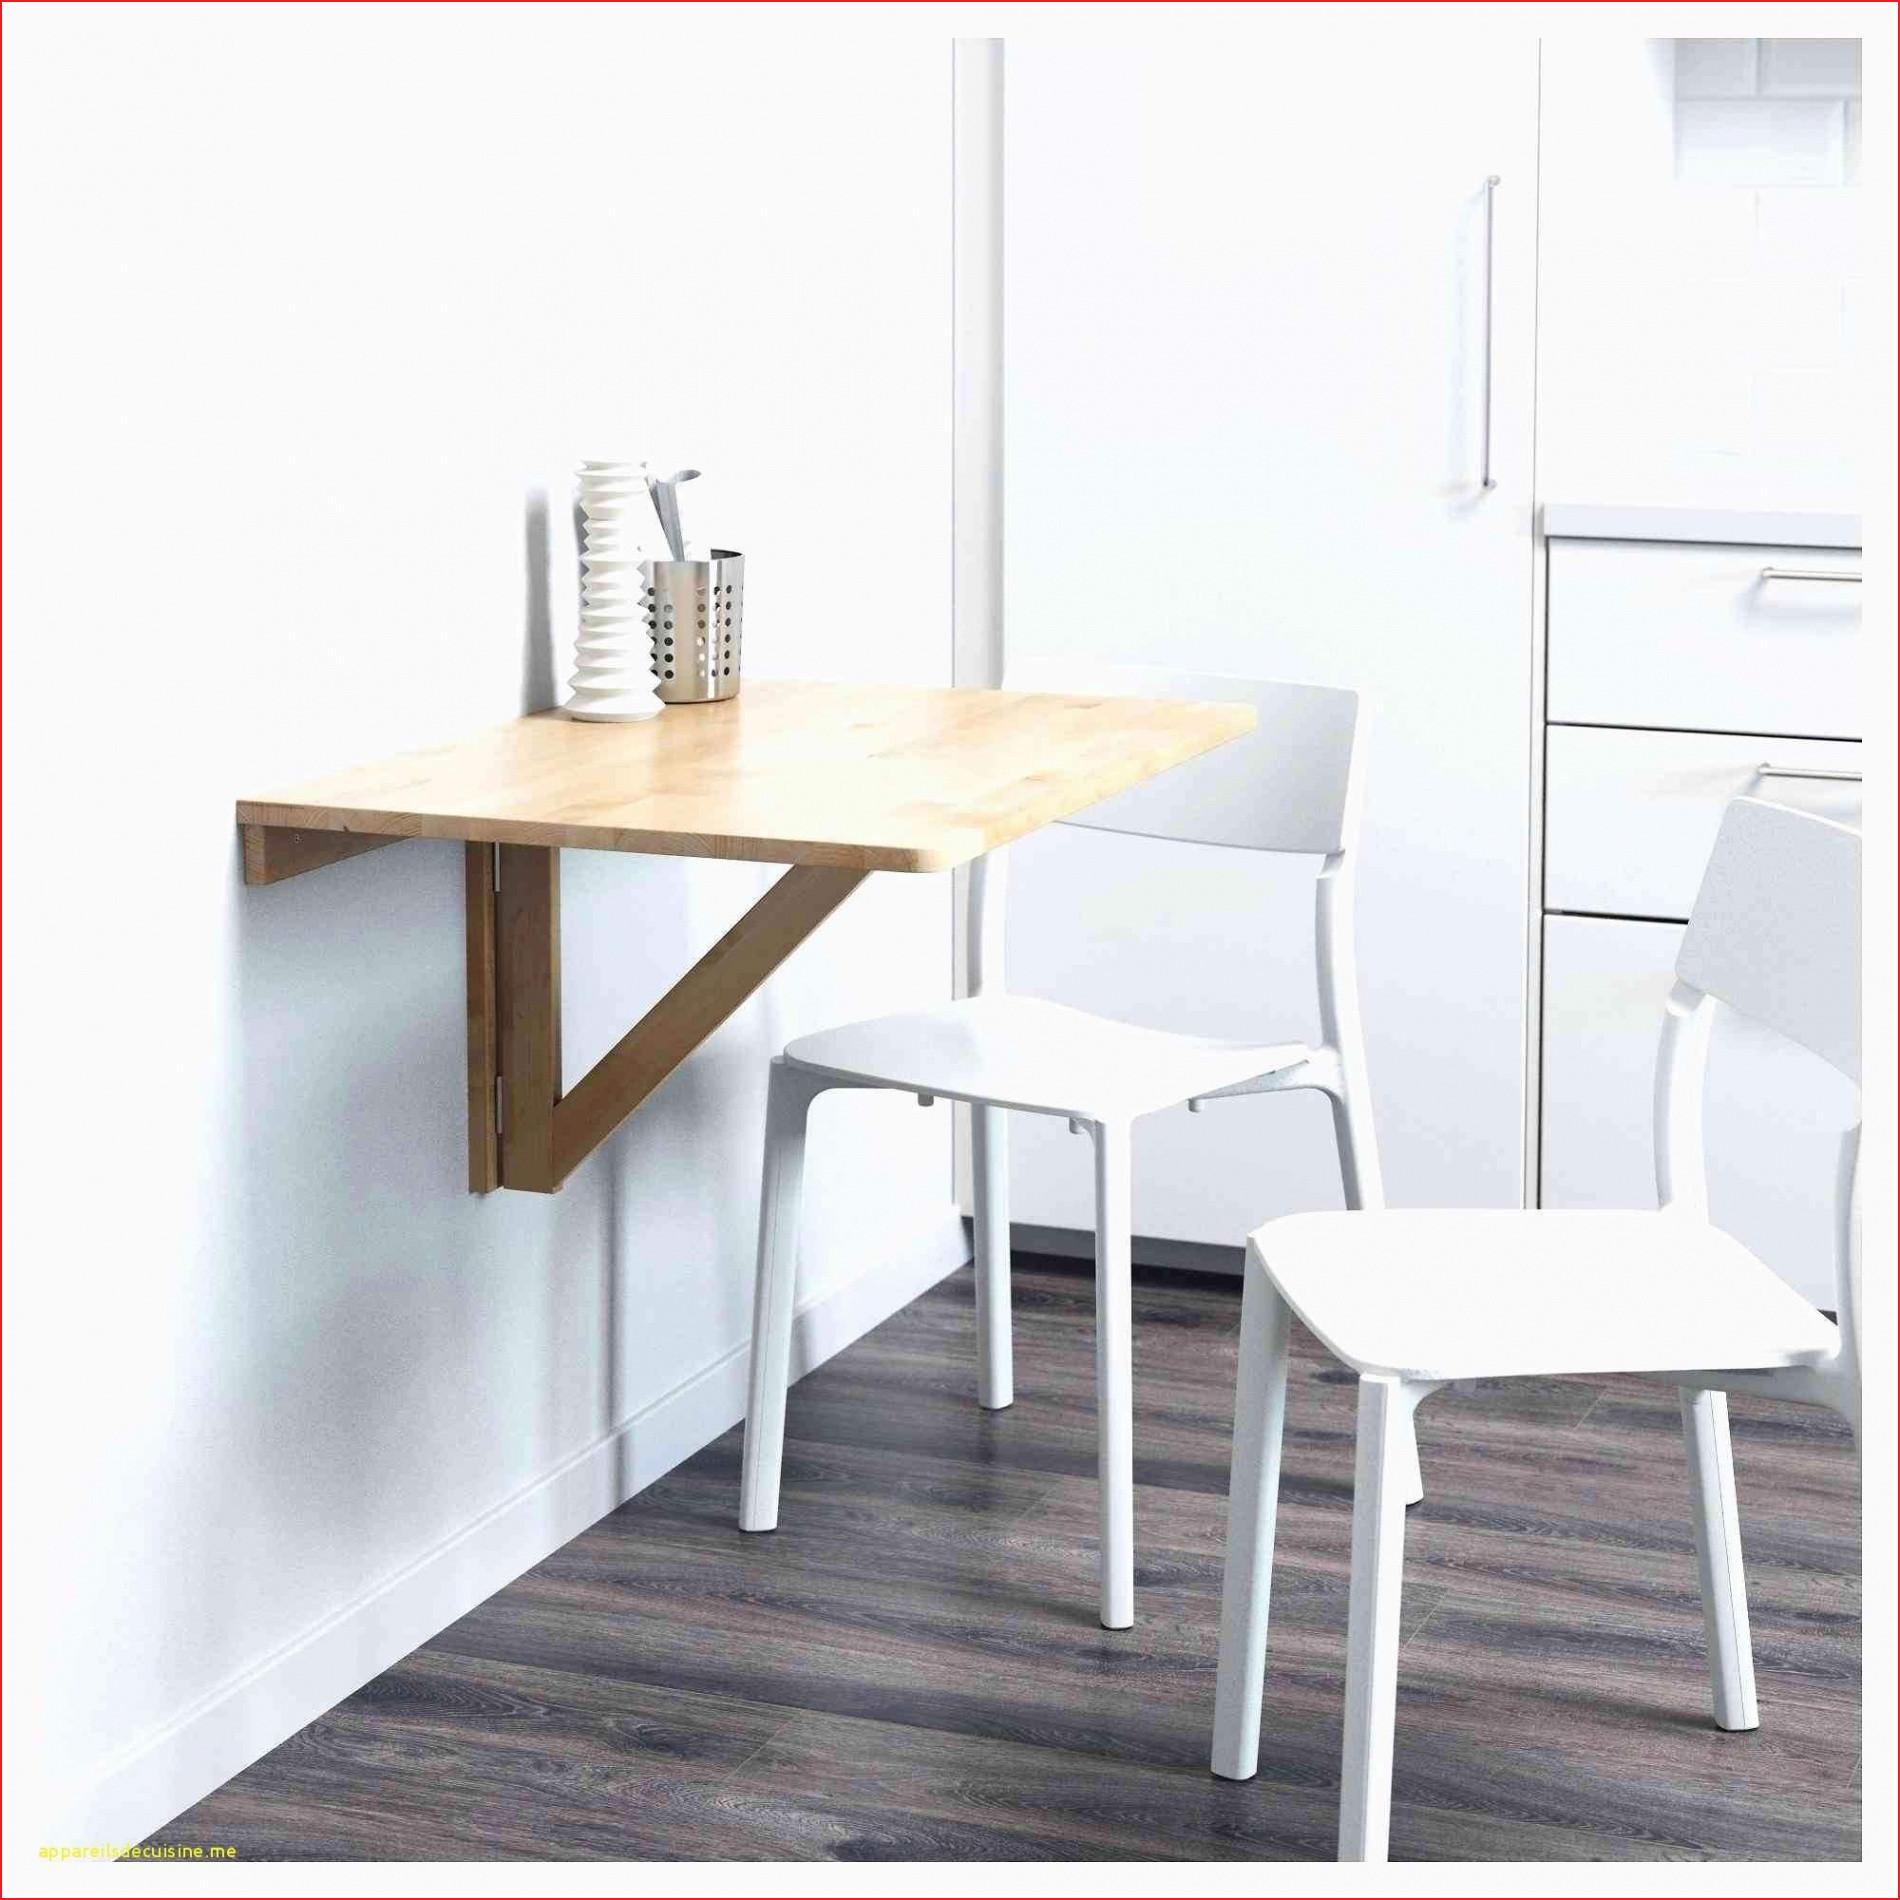 chaise photo chaise pliante but location table chaise table haute but of chaise photo